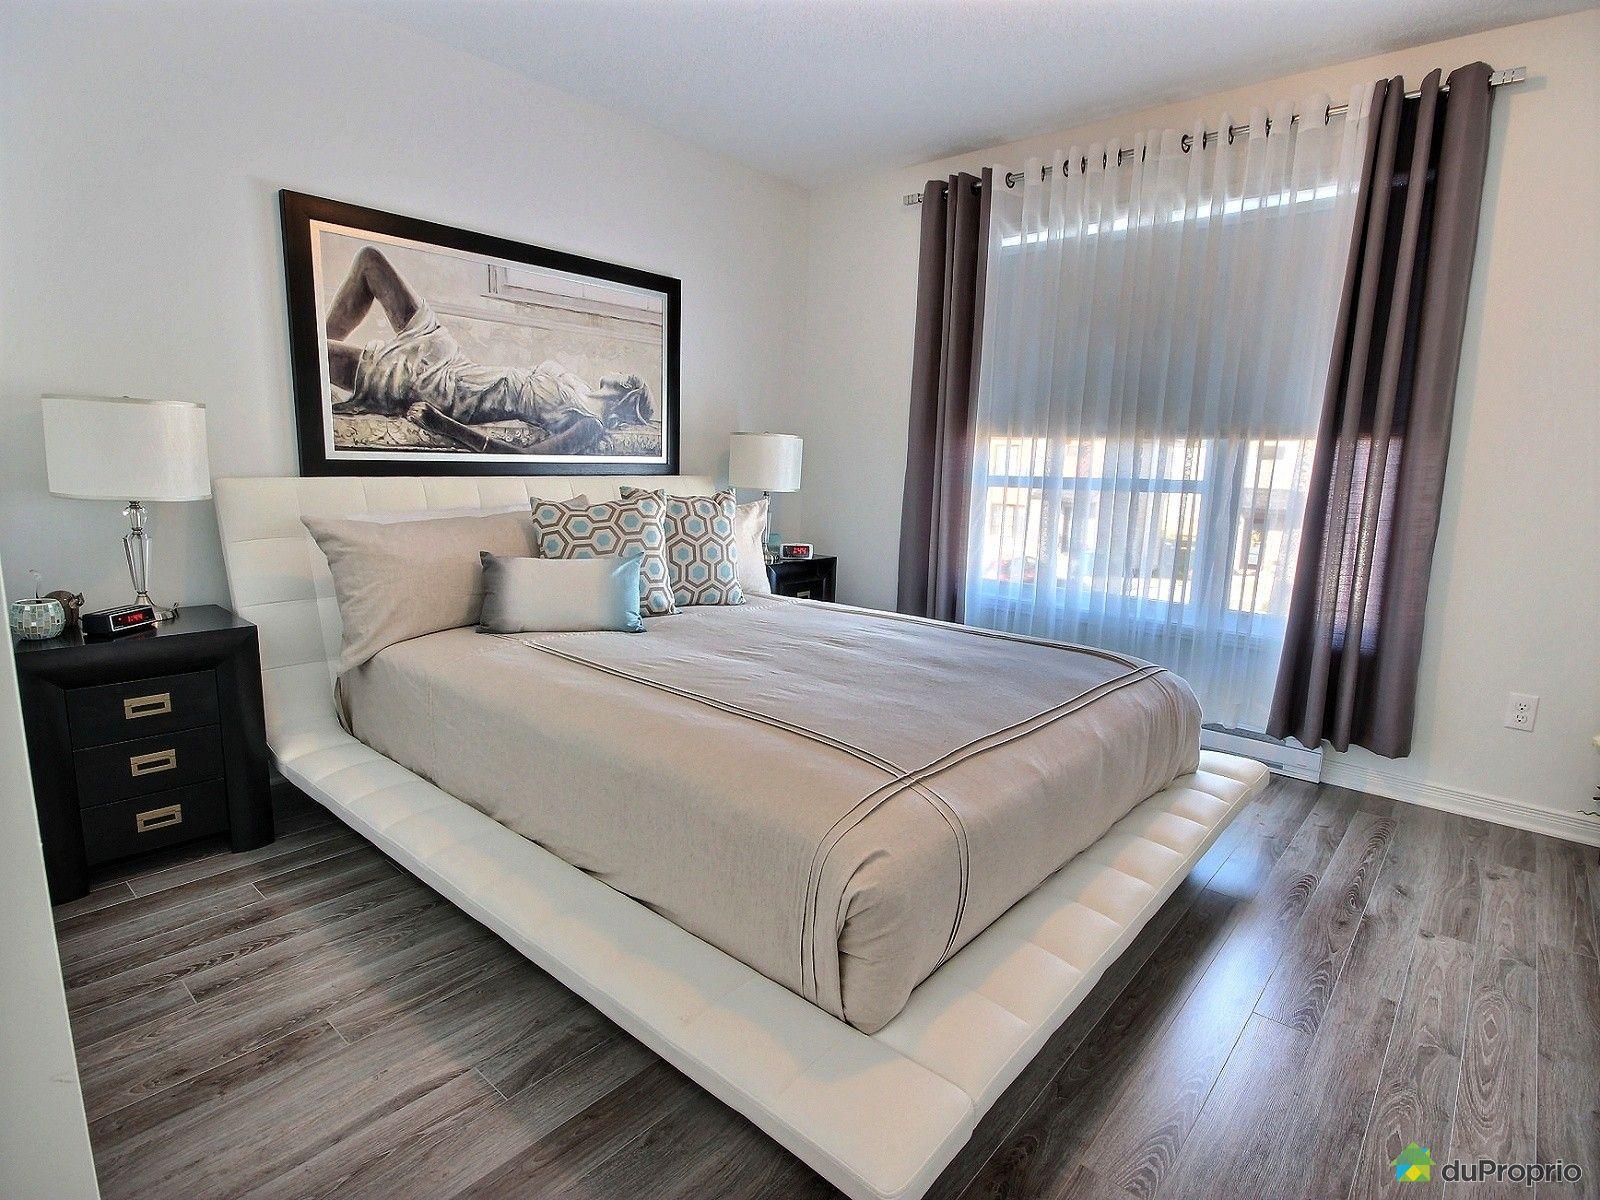 jumel neuf vendre masson angers rue des becs scie secteur angers immobilier qu bec. Black Bedroom Furniture Sets. Home Design Ideas